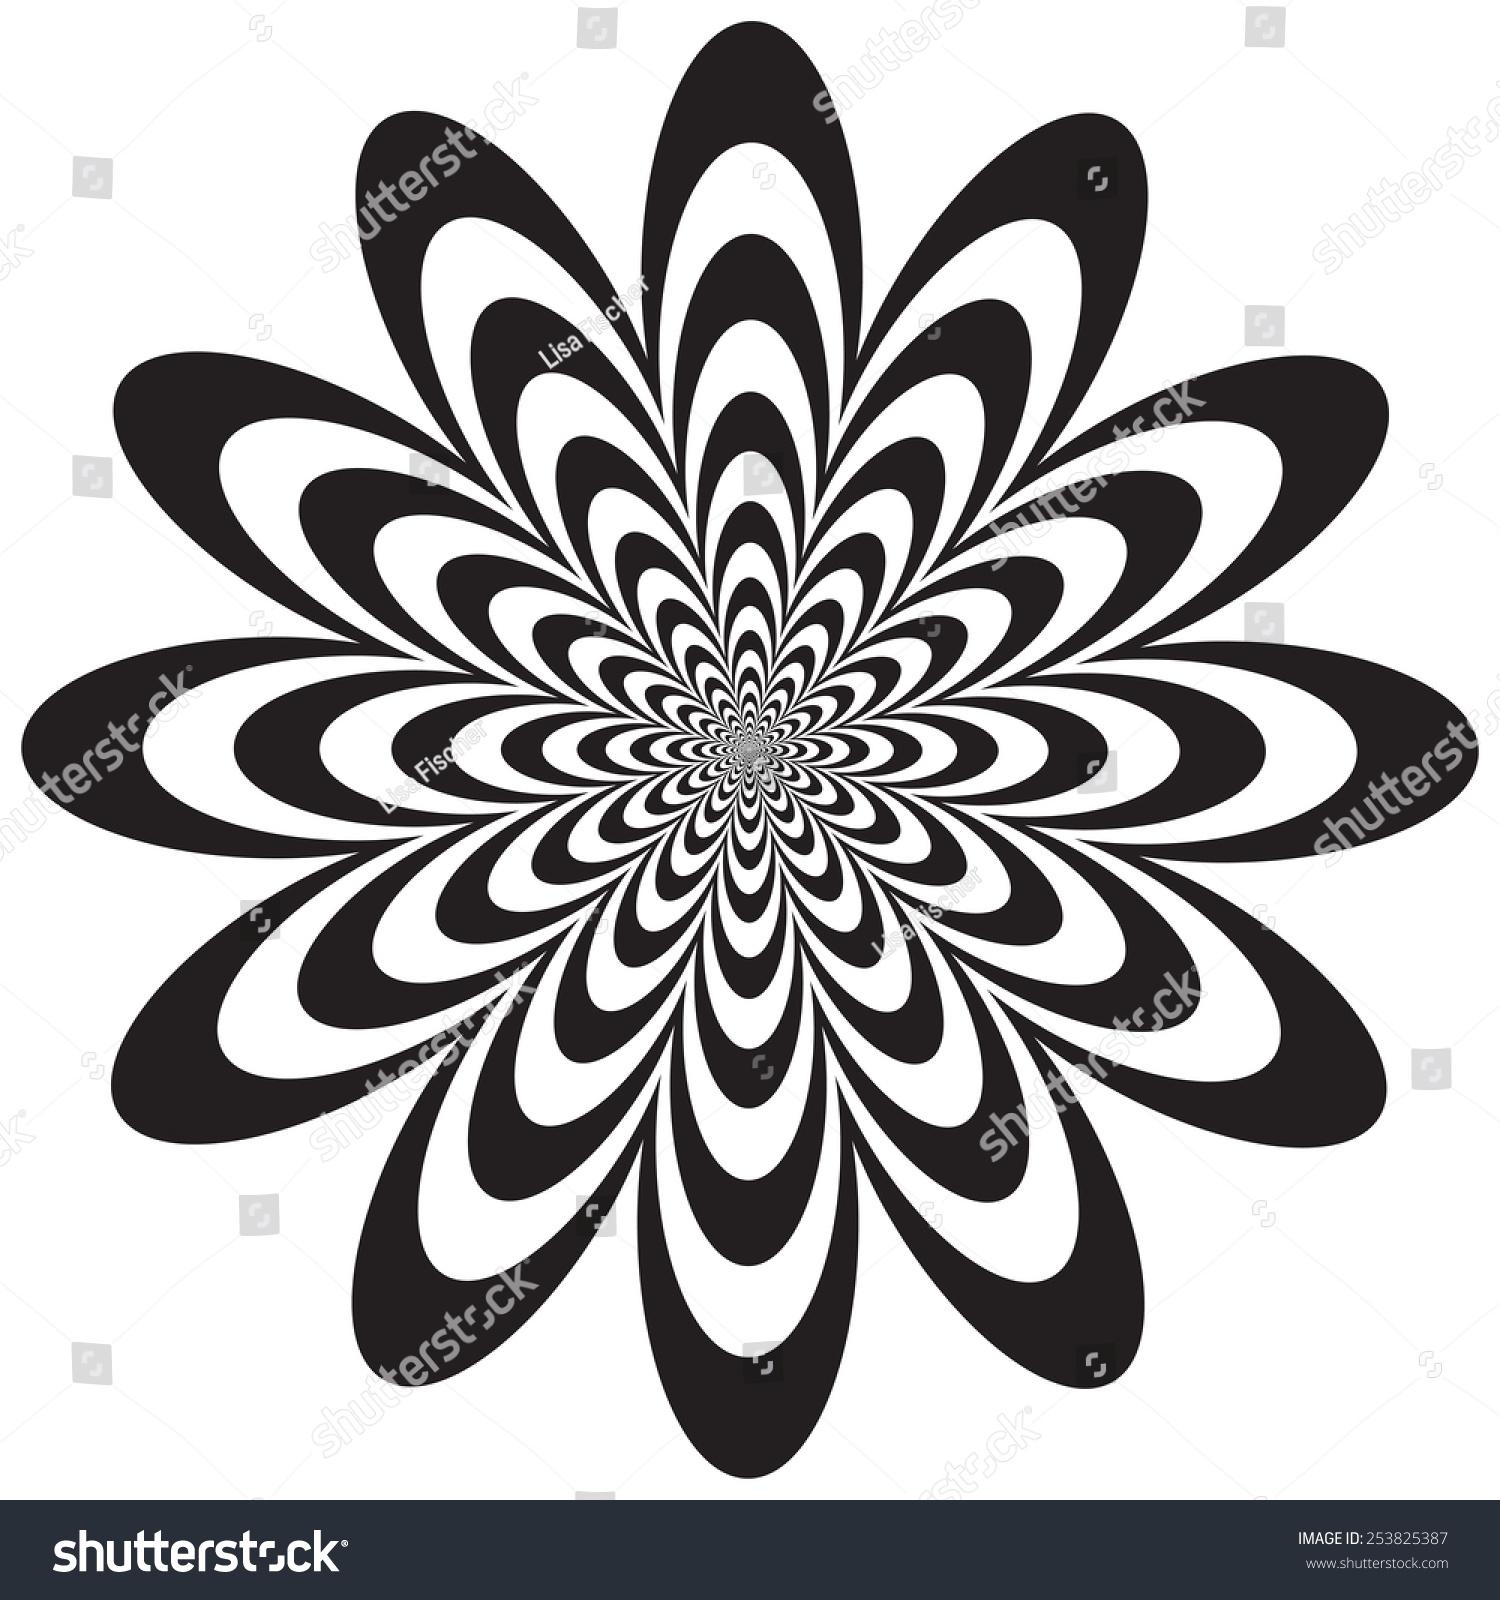 royalty free op art flower optical illusion design 253825387 stock